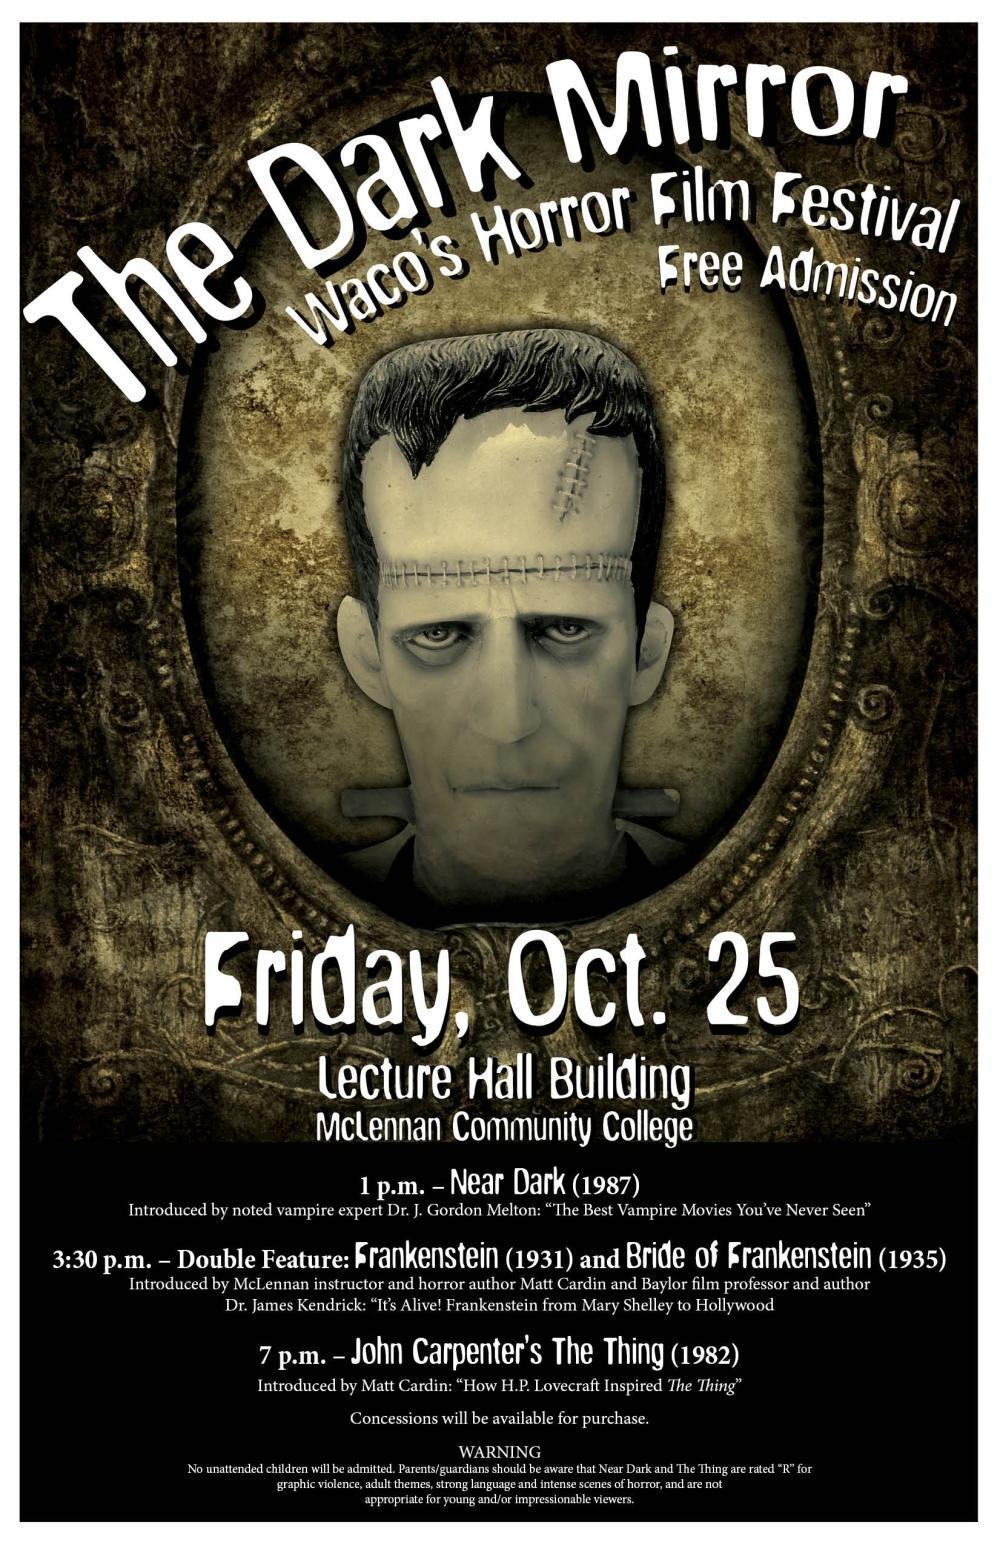 Vampires, Frankenstein, and Alien Horror: The Dark Mirror Film